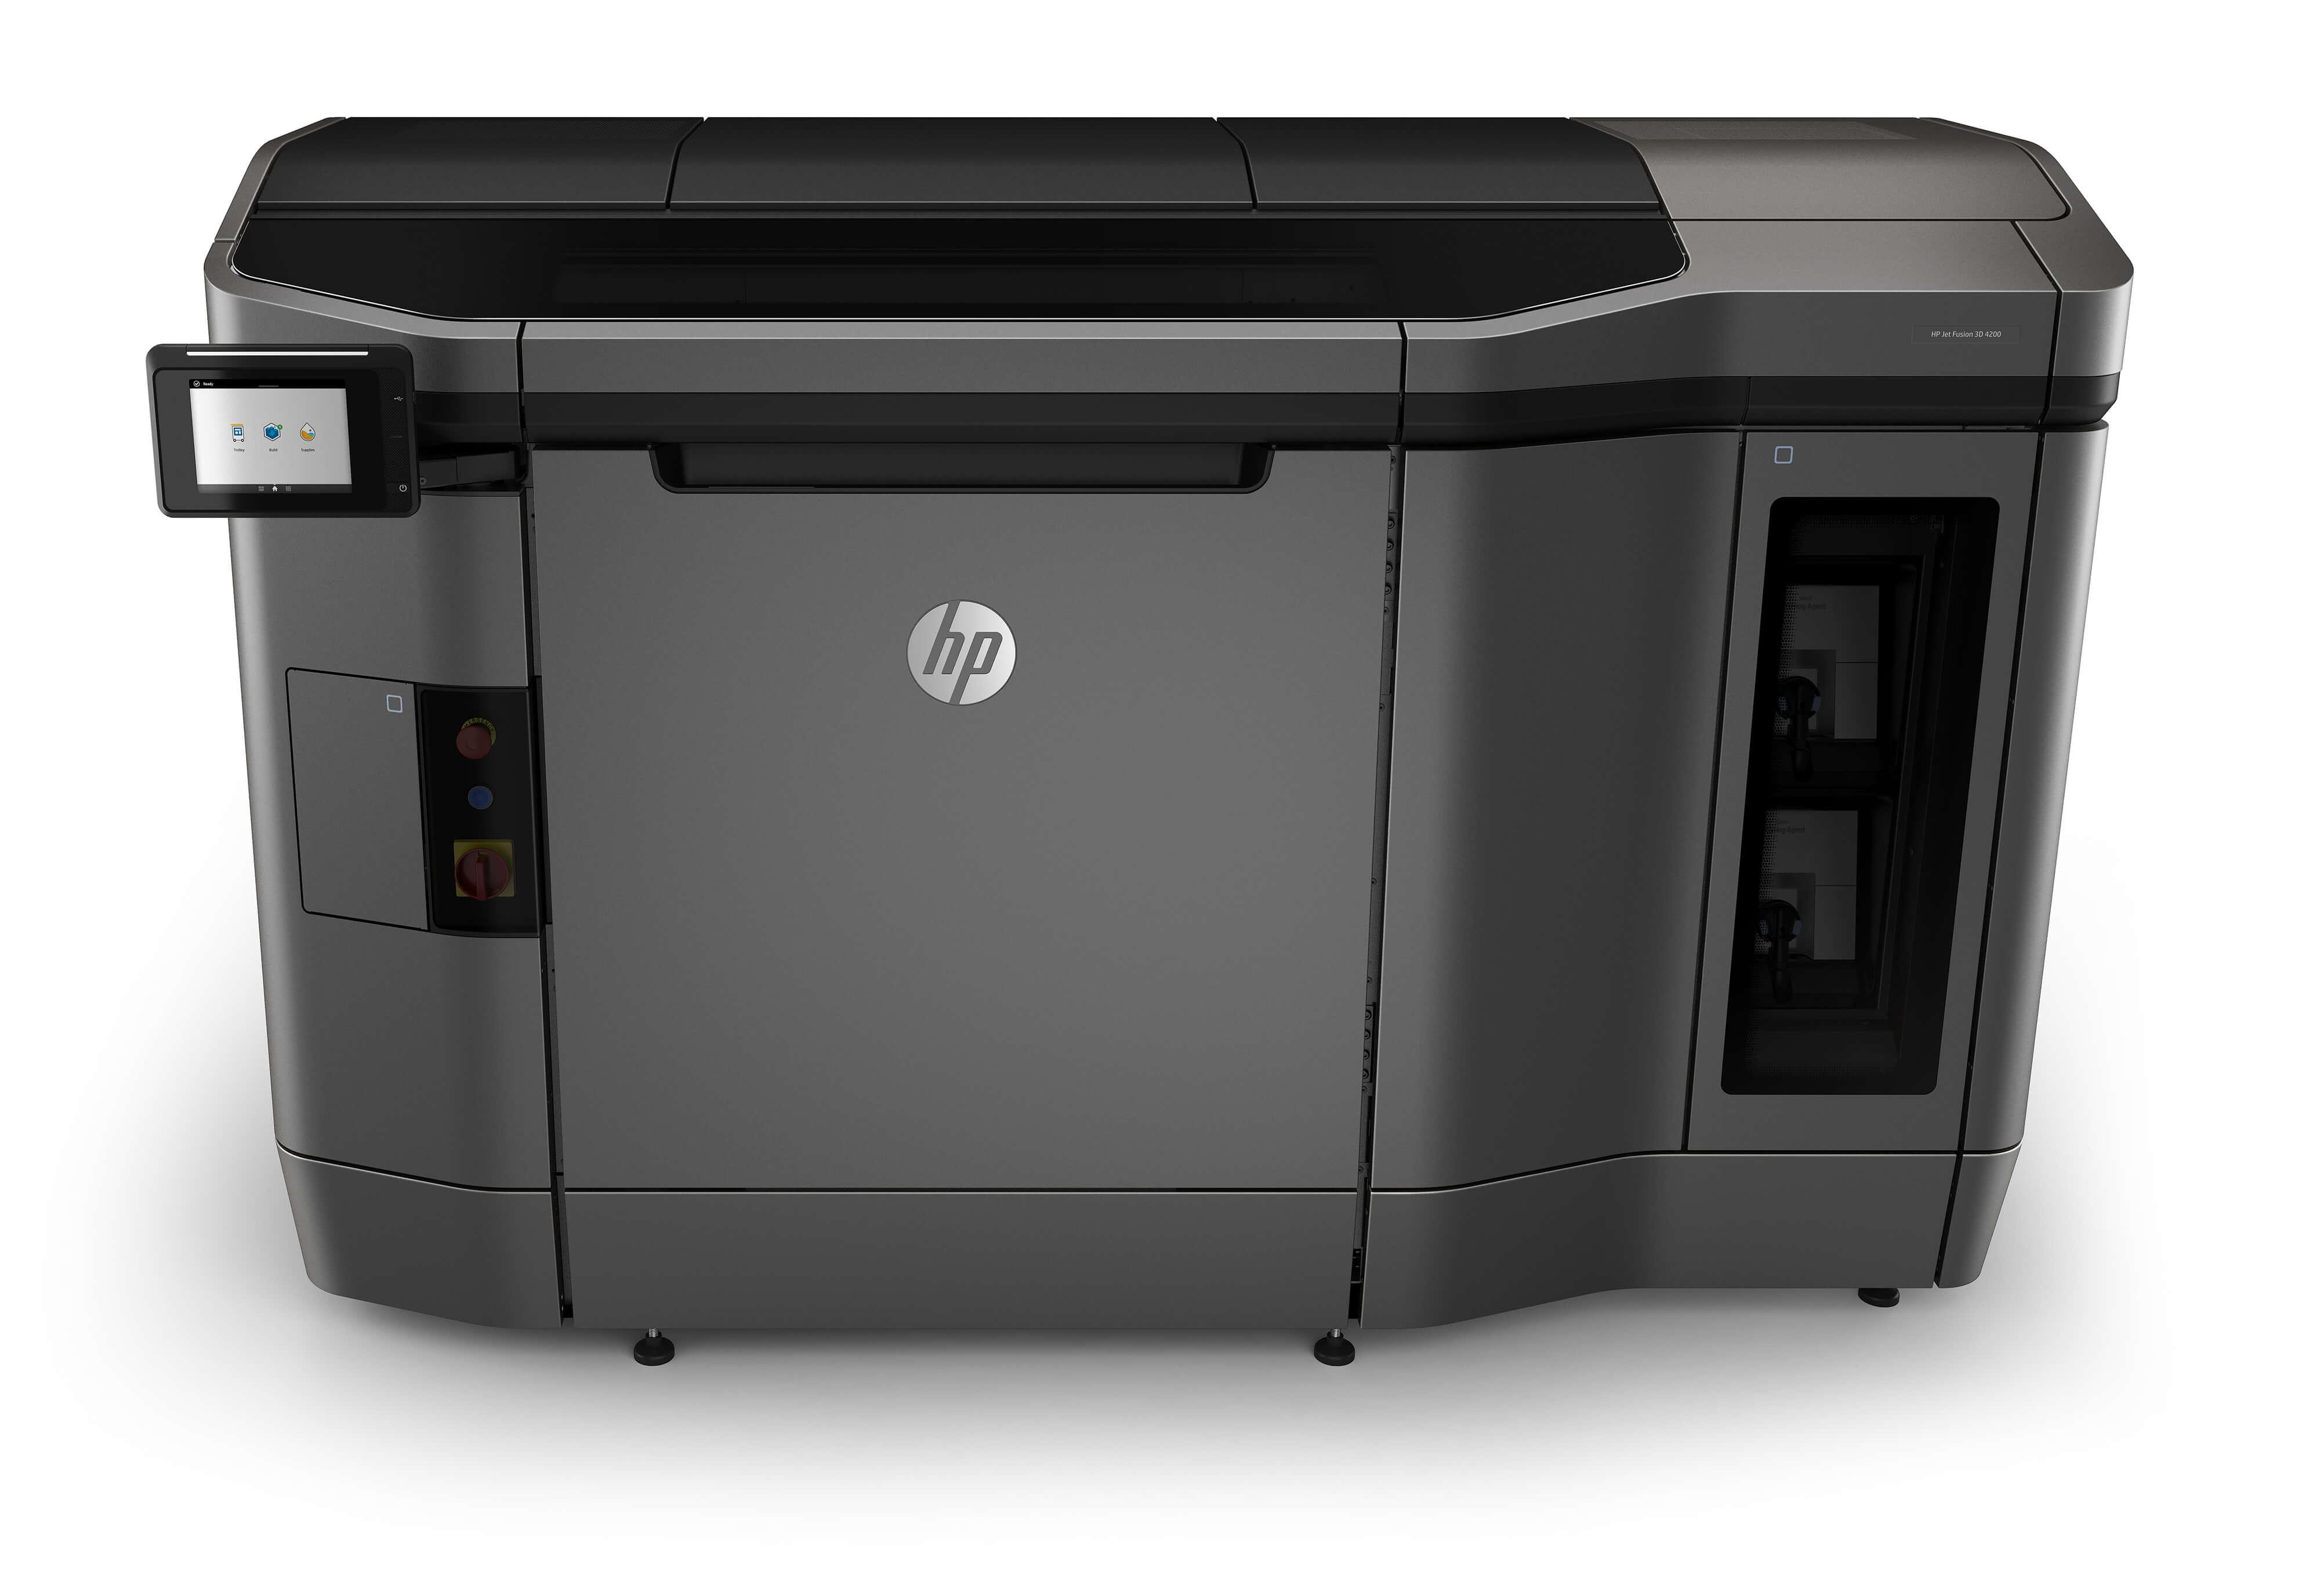 HP MJF Multi-Jet Fusion 3D Printer SIGMADESIGN